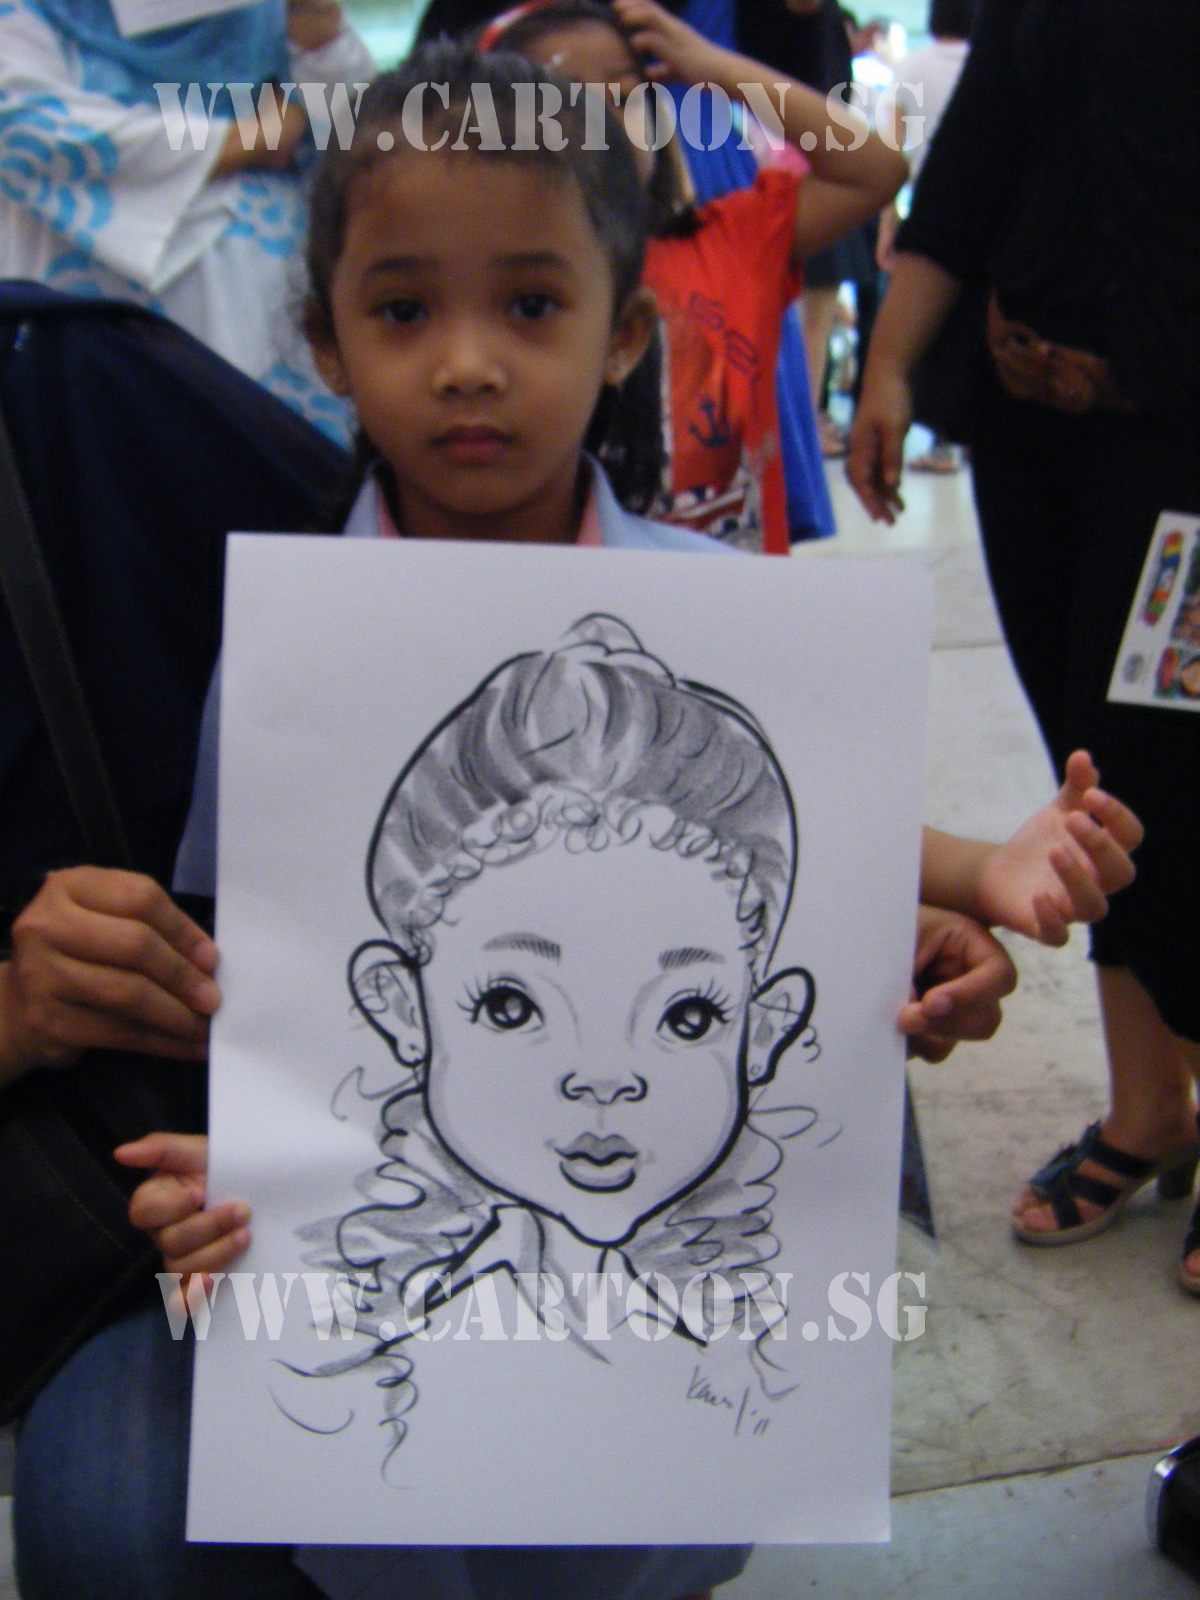 pcf-caricature-01.jpg